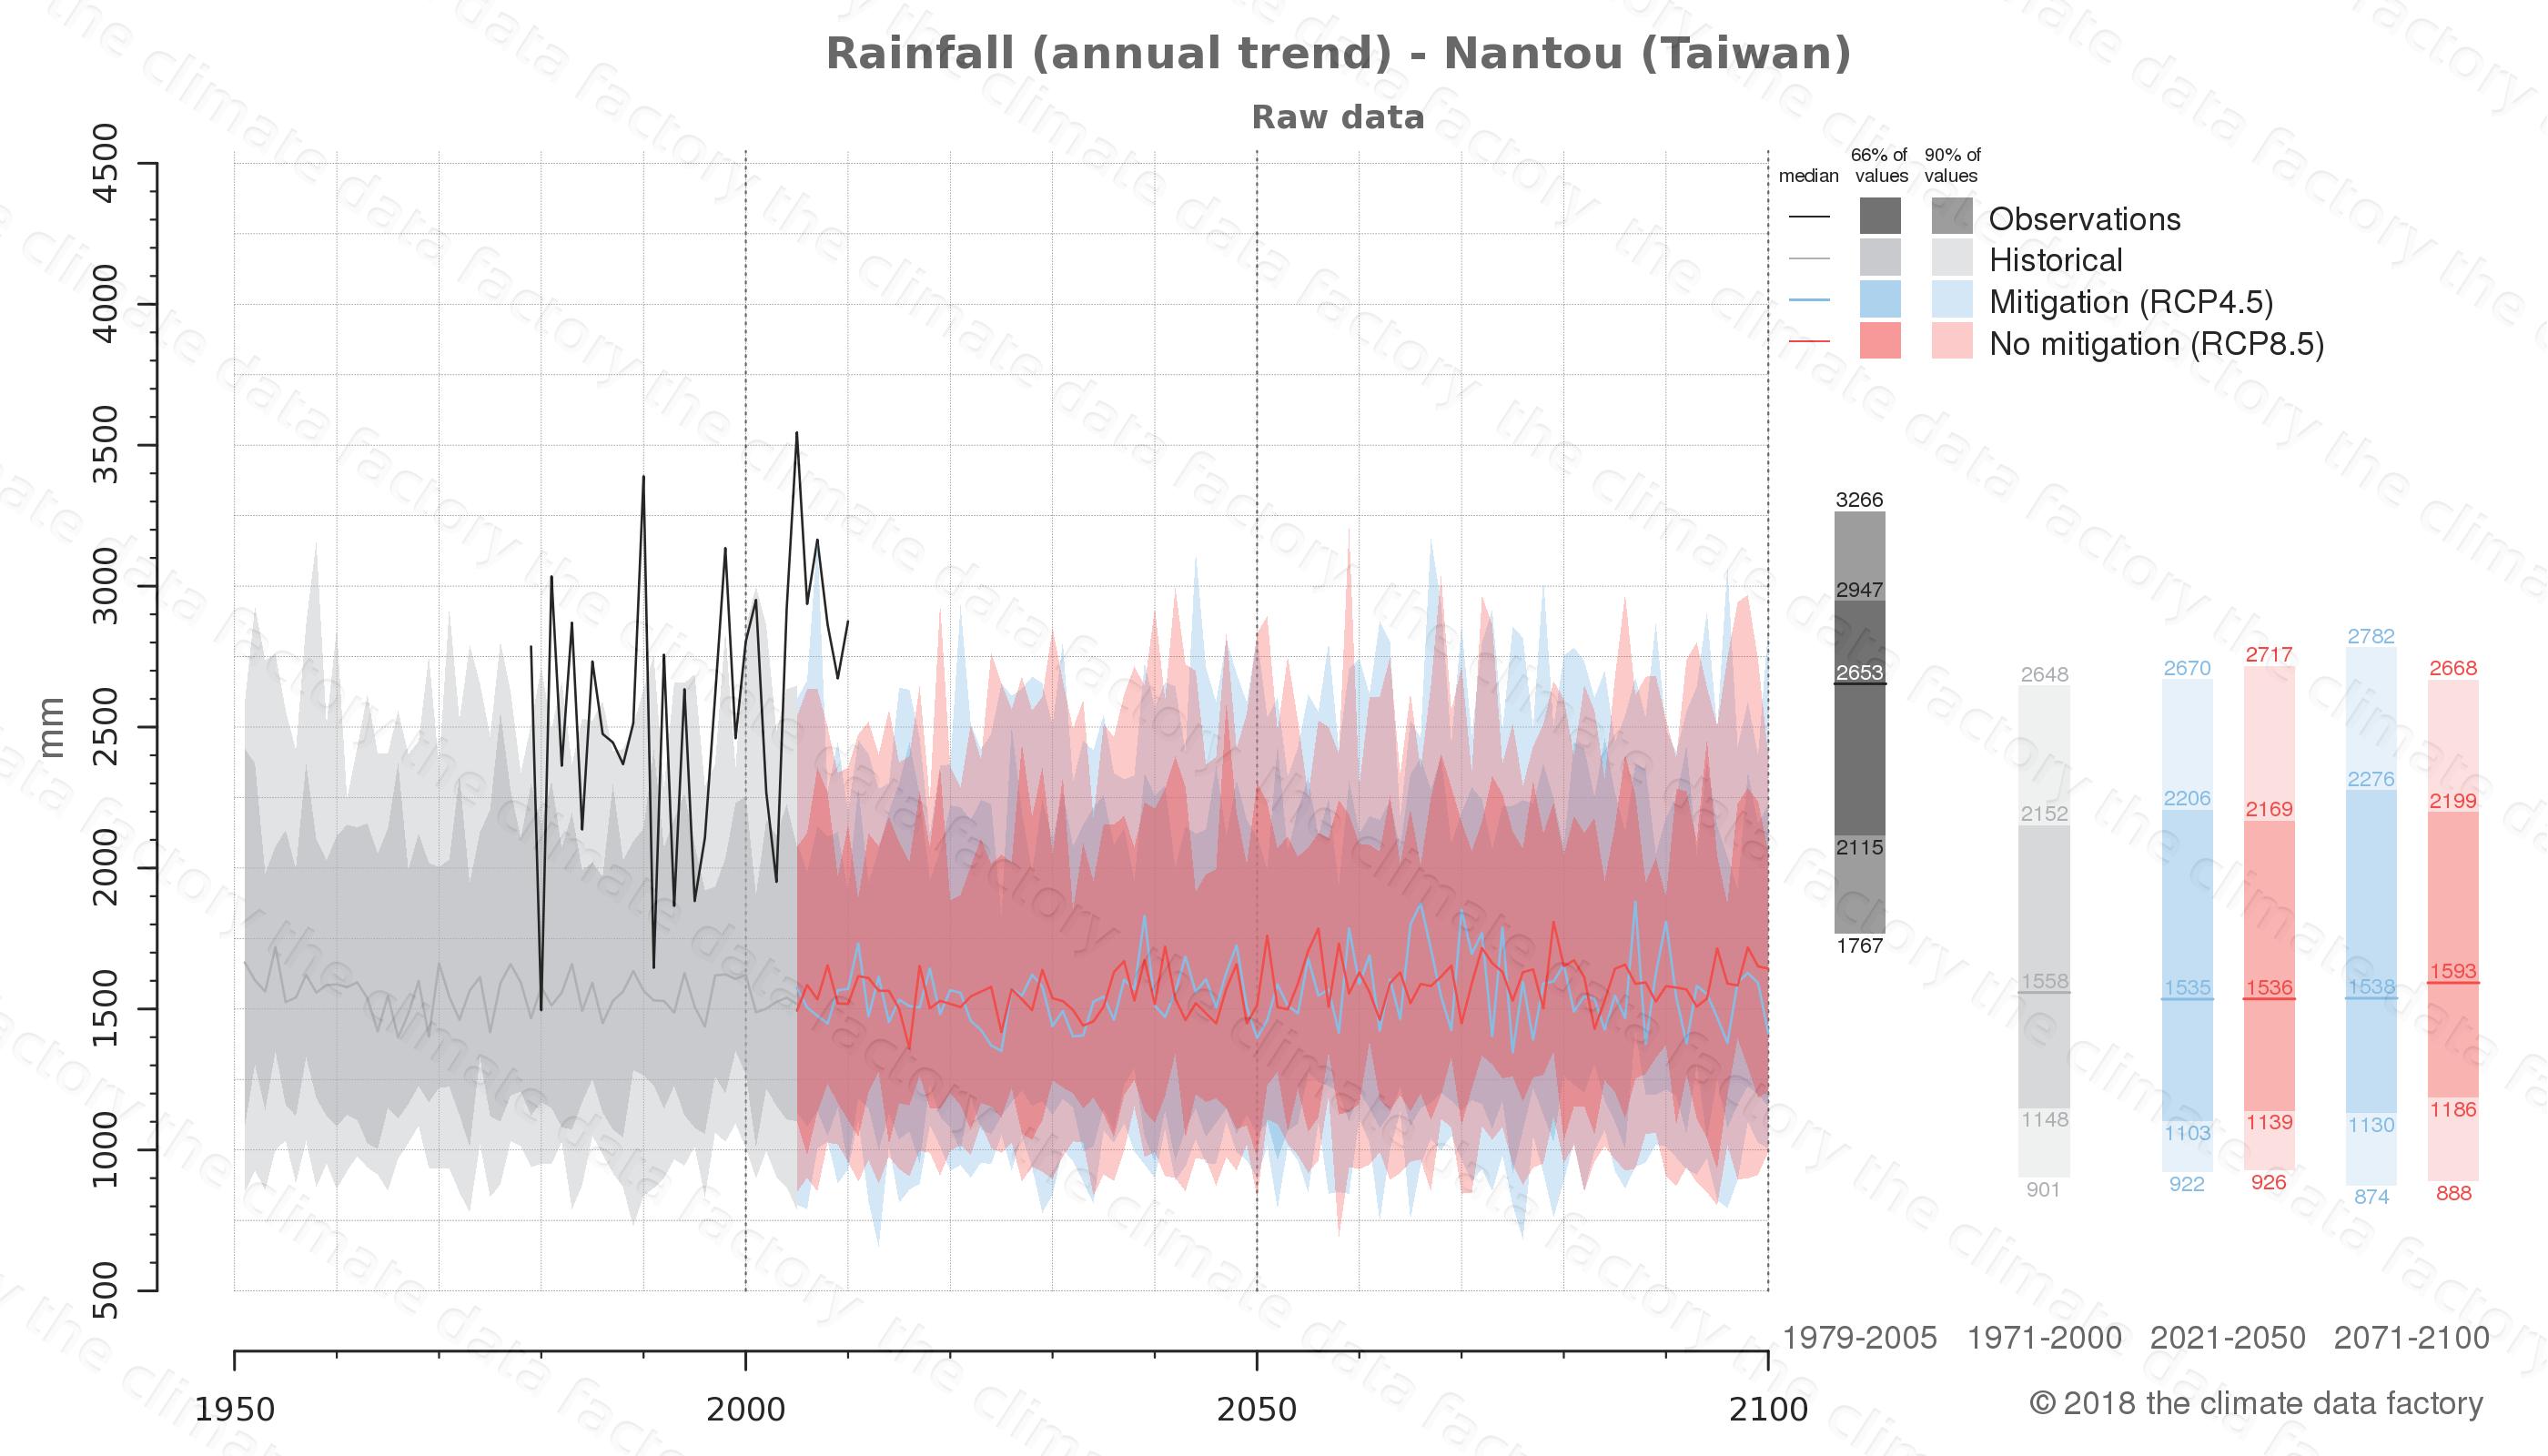 climate change data policy adaptation climate graph city data rainfall nantou taiwan